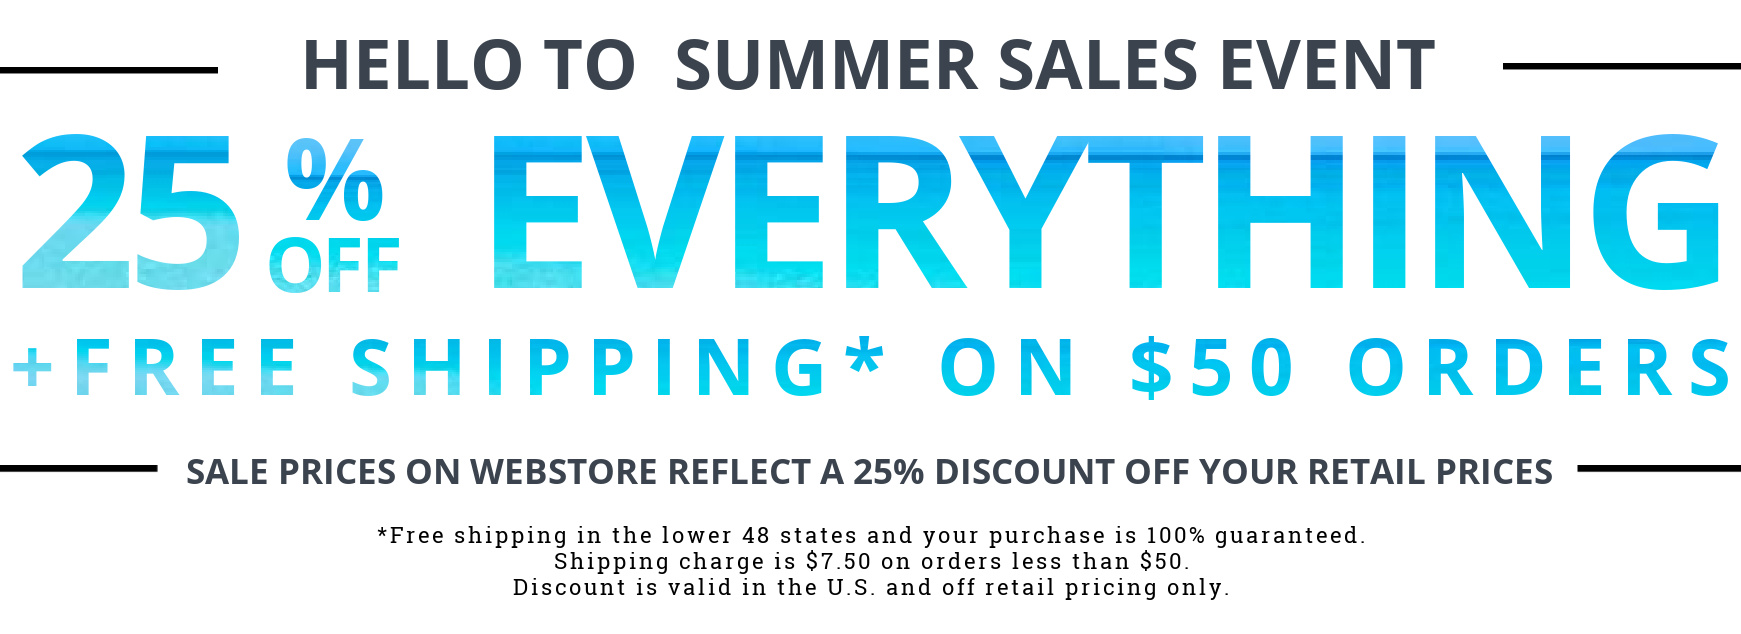 new-summer-sales-event.jpg